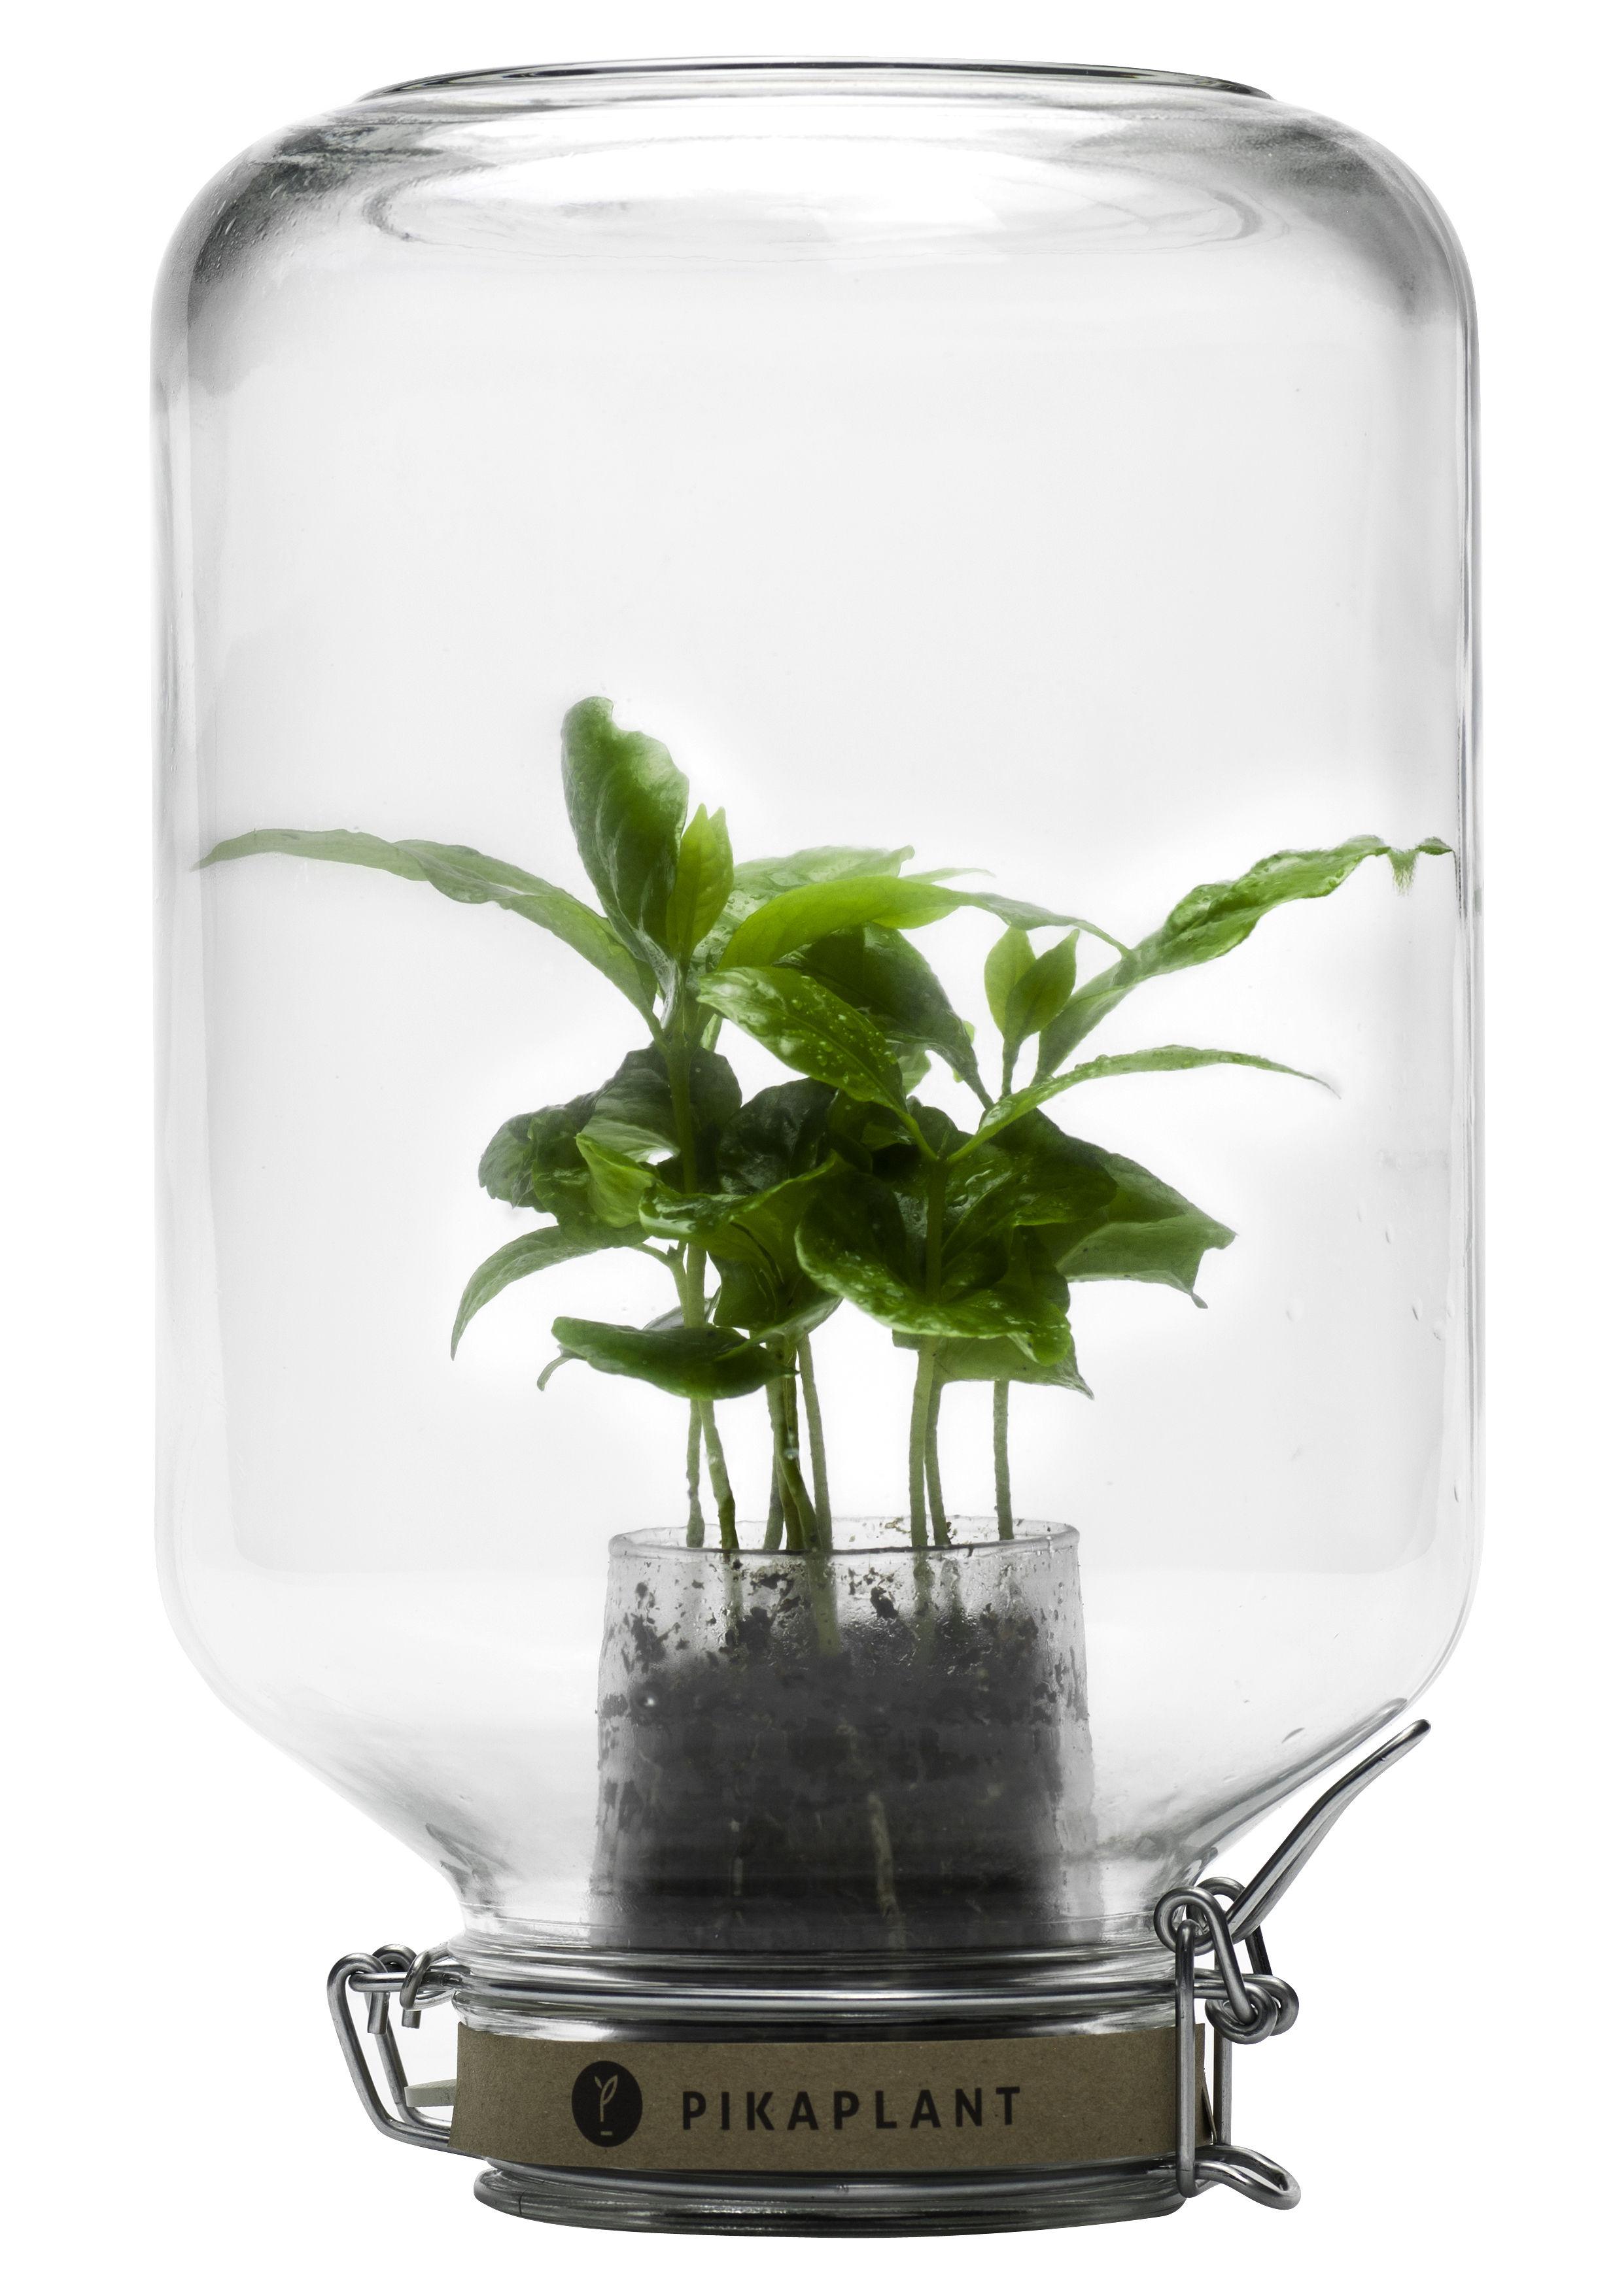 Decoration - Flower Pots & House Plants - Jar Self-sufficient greenhouse - / Mini coffee bush included - H 28 cm by Pikaplant - Transparent - Glass, Rubber, Steel